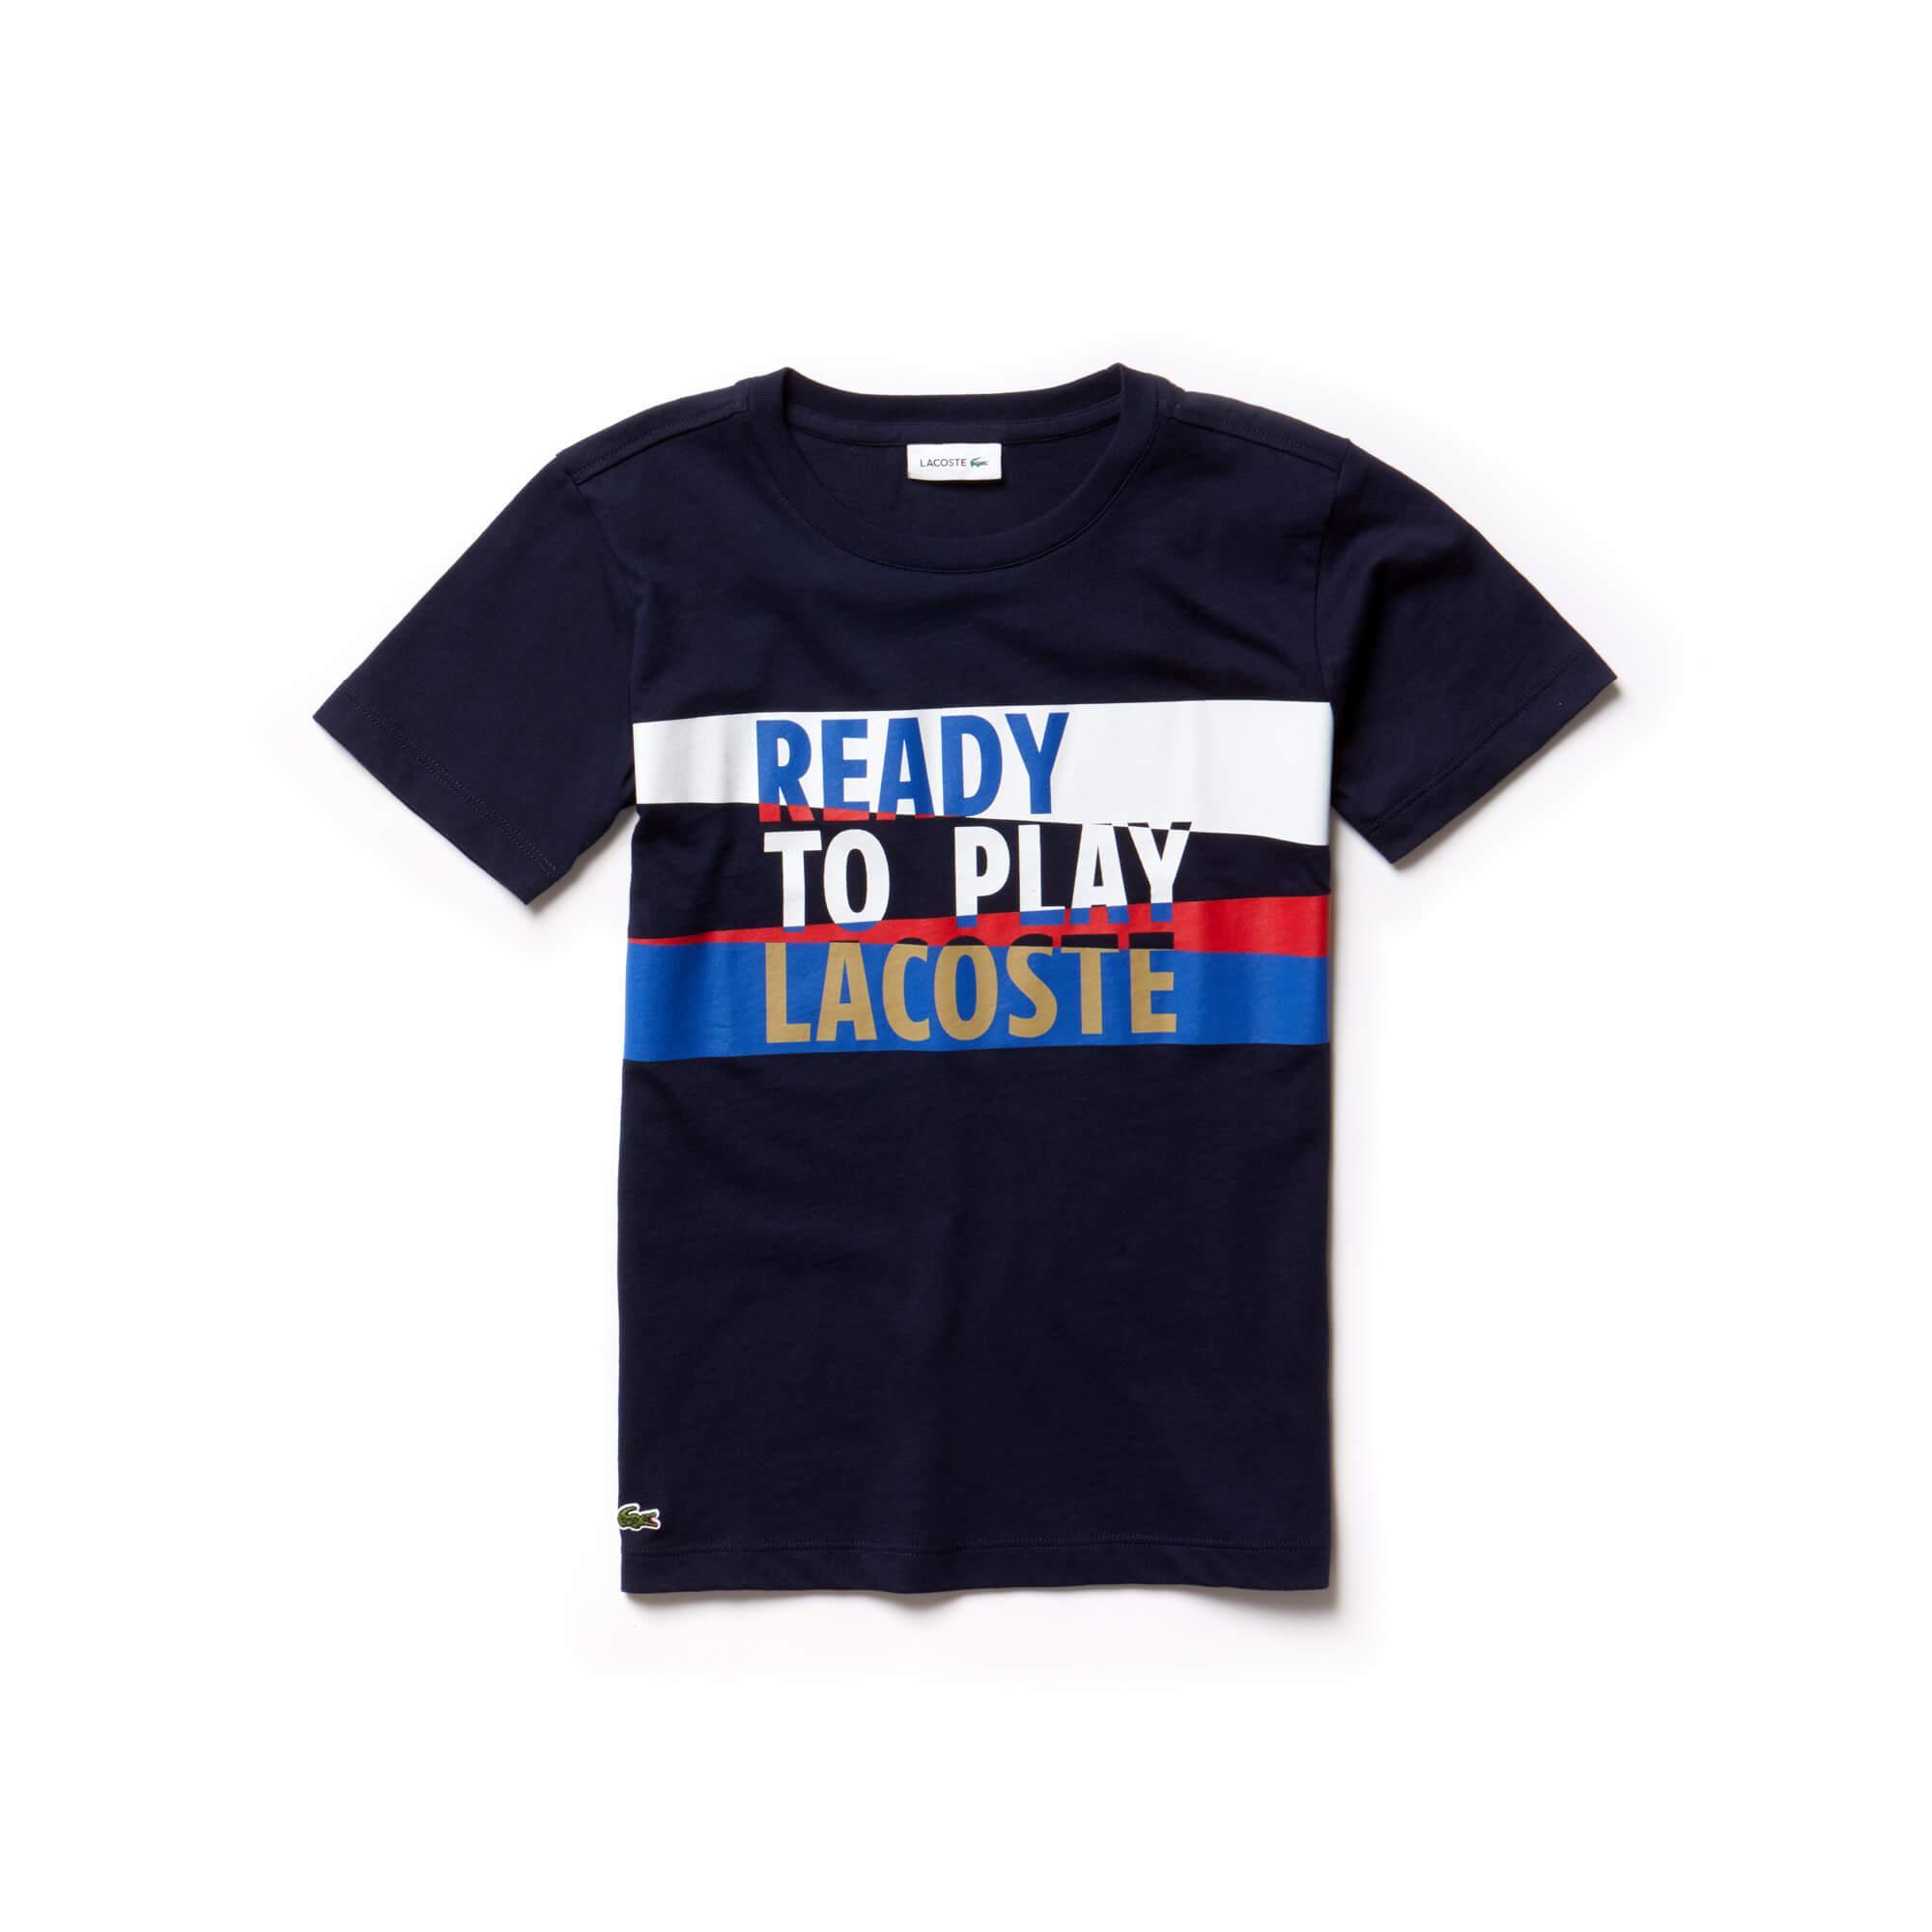 Lacoste Çocuk Lacivert T-Shirt